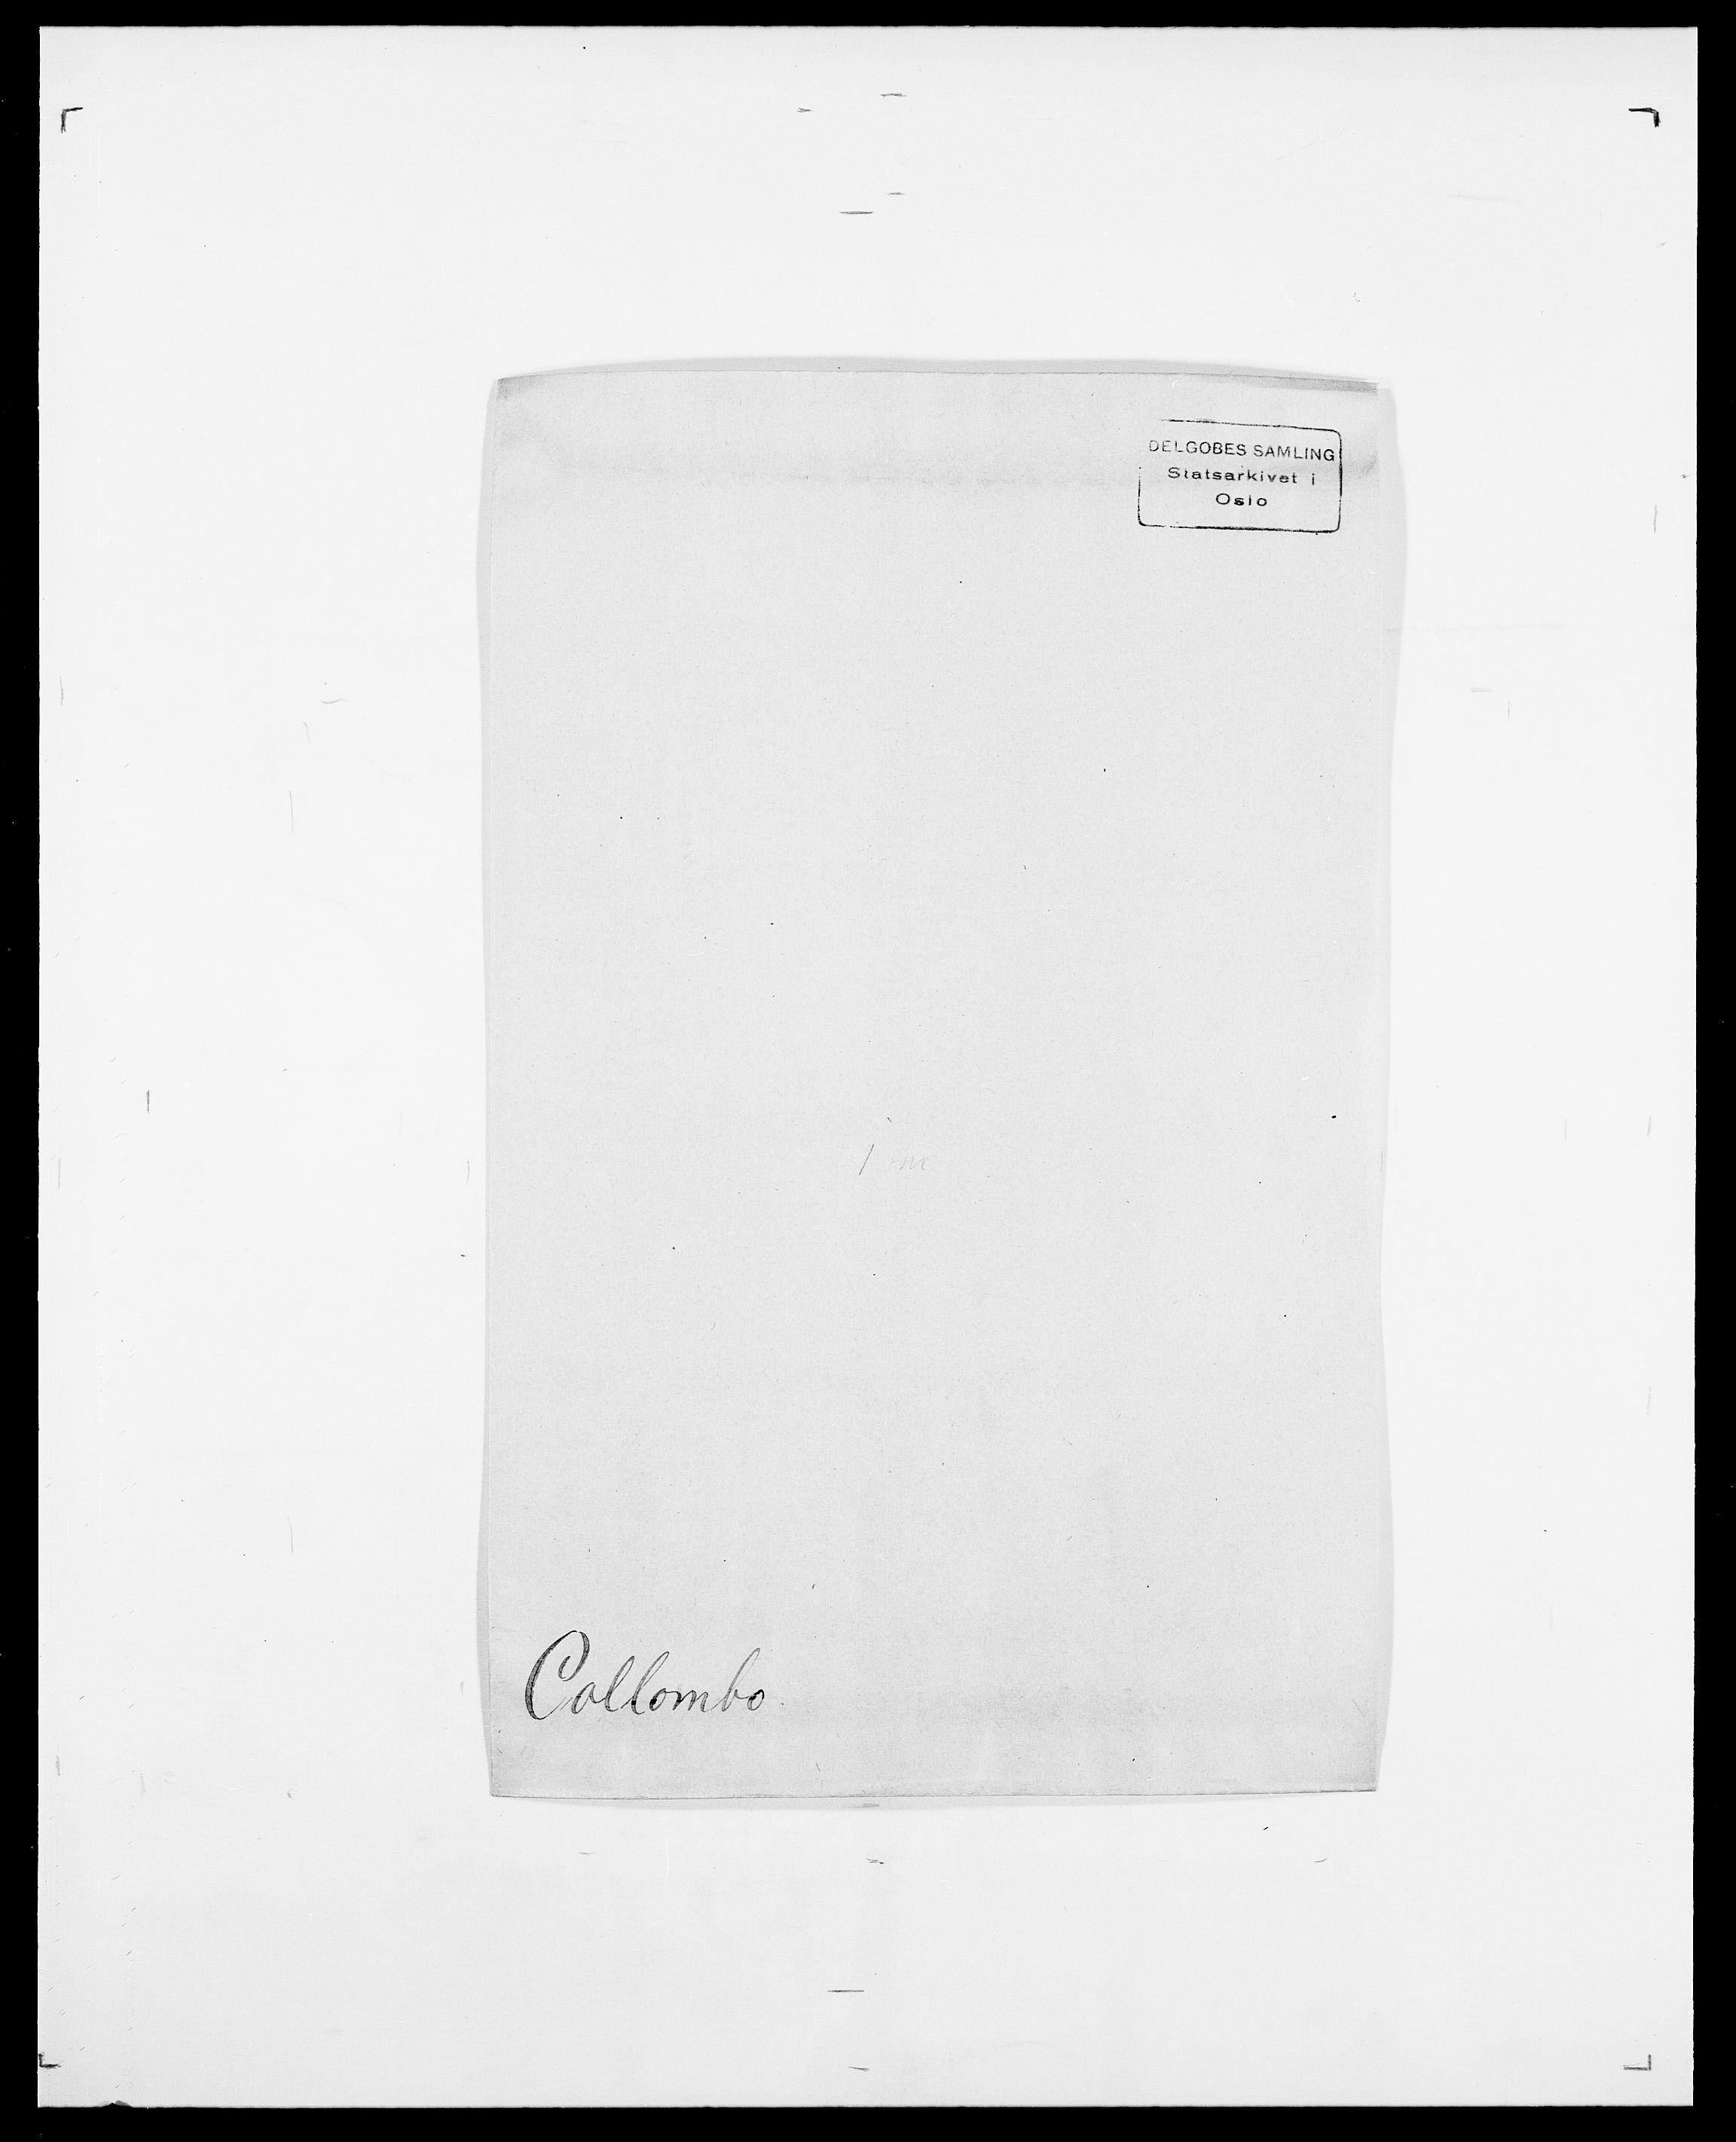 SAO, Delgobe, Charles Antoine - samling, D/Da/L0008: Capjon - Dagenbolt, s. 483